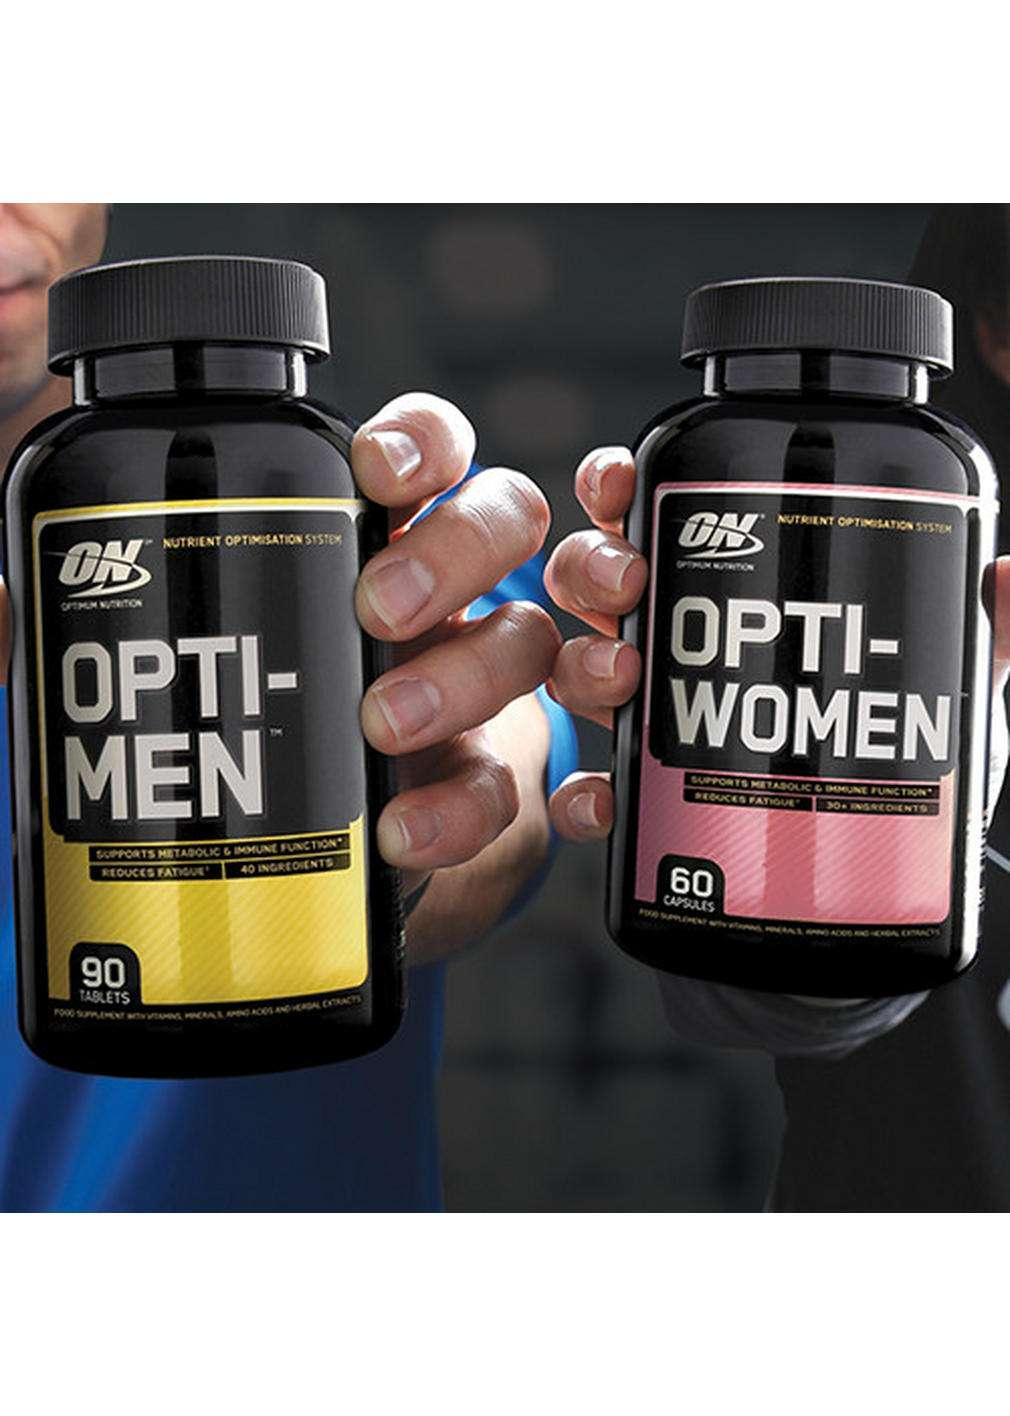 Buy Optimum Nutrition OPTI–WOMEN Multivitamin Capsules In All Over Lahore Pakistan 2021, Opti-WoMen 120 Capsules Price In Pakistan, www.arnutrition.pk iS The Best Food Supplements Store